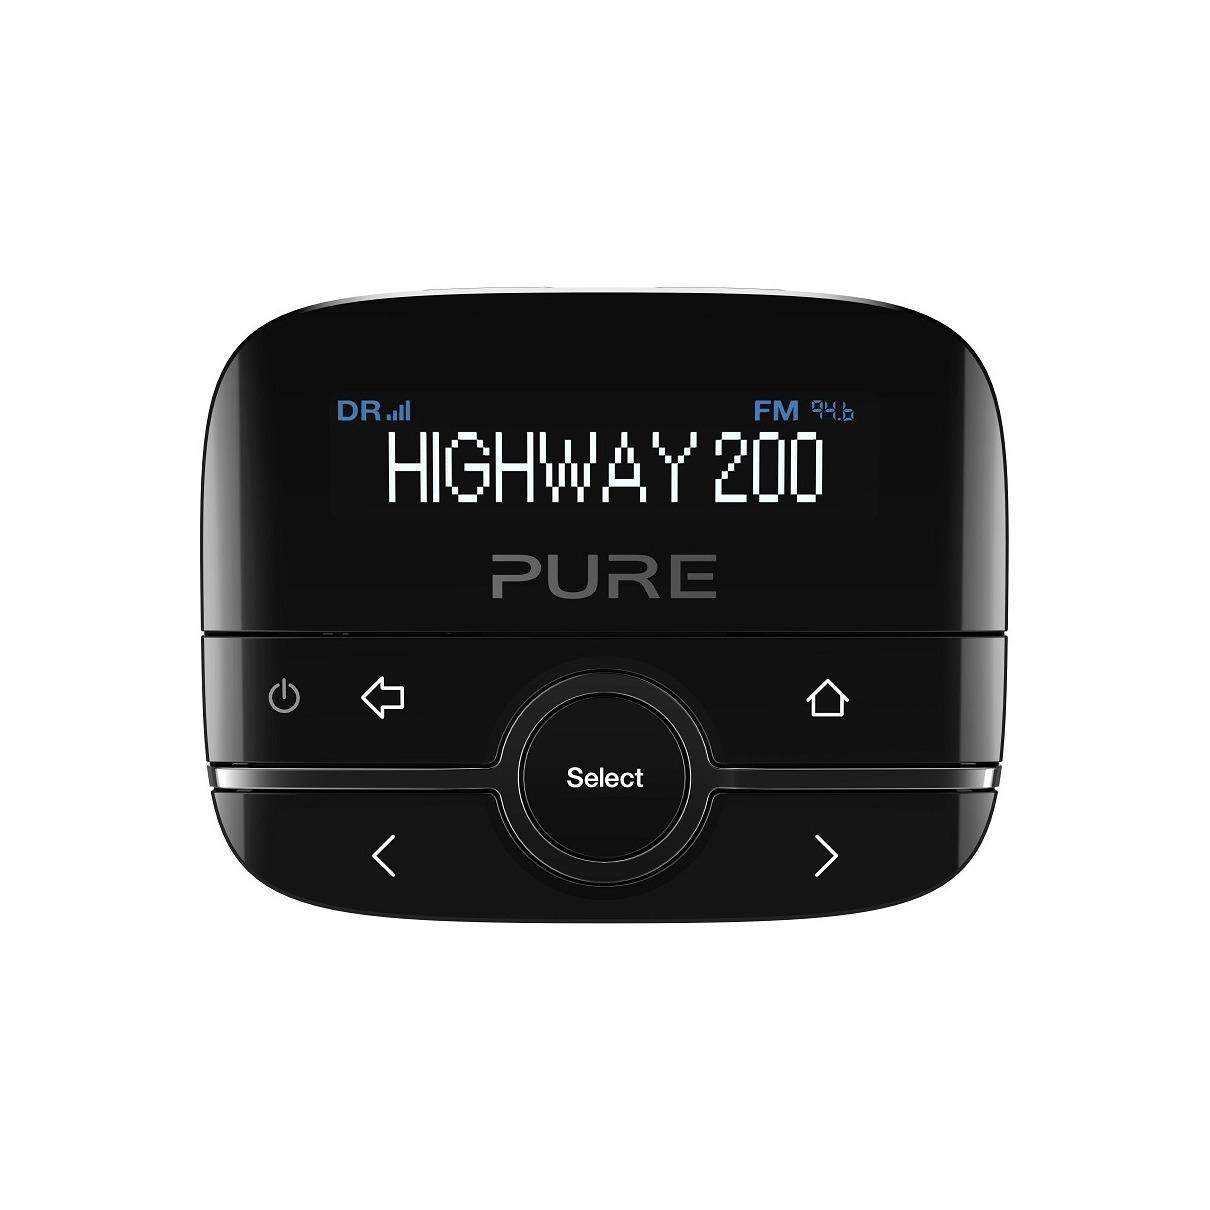 Pure car audio Highway 200